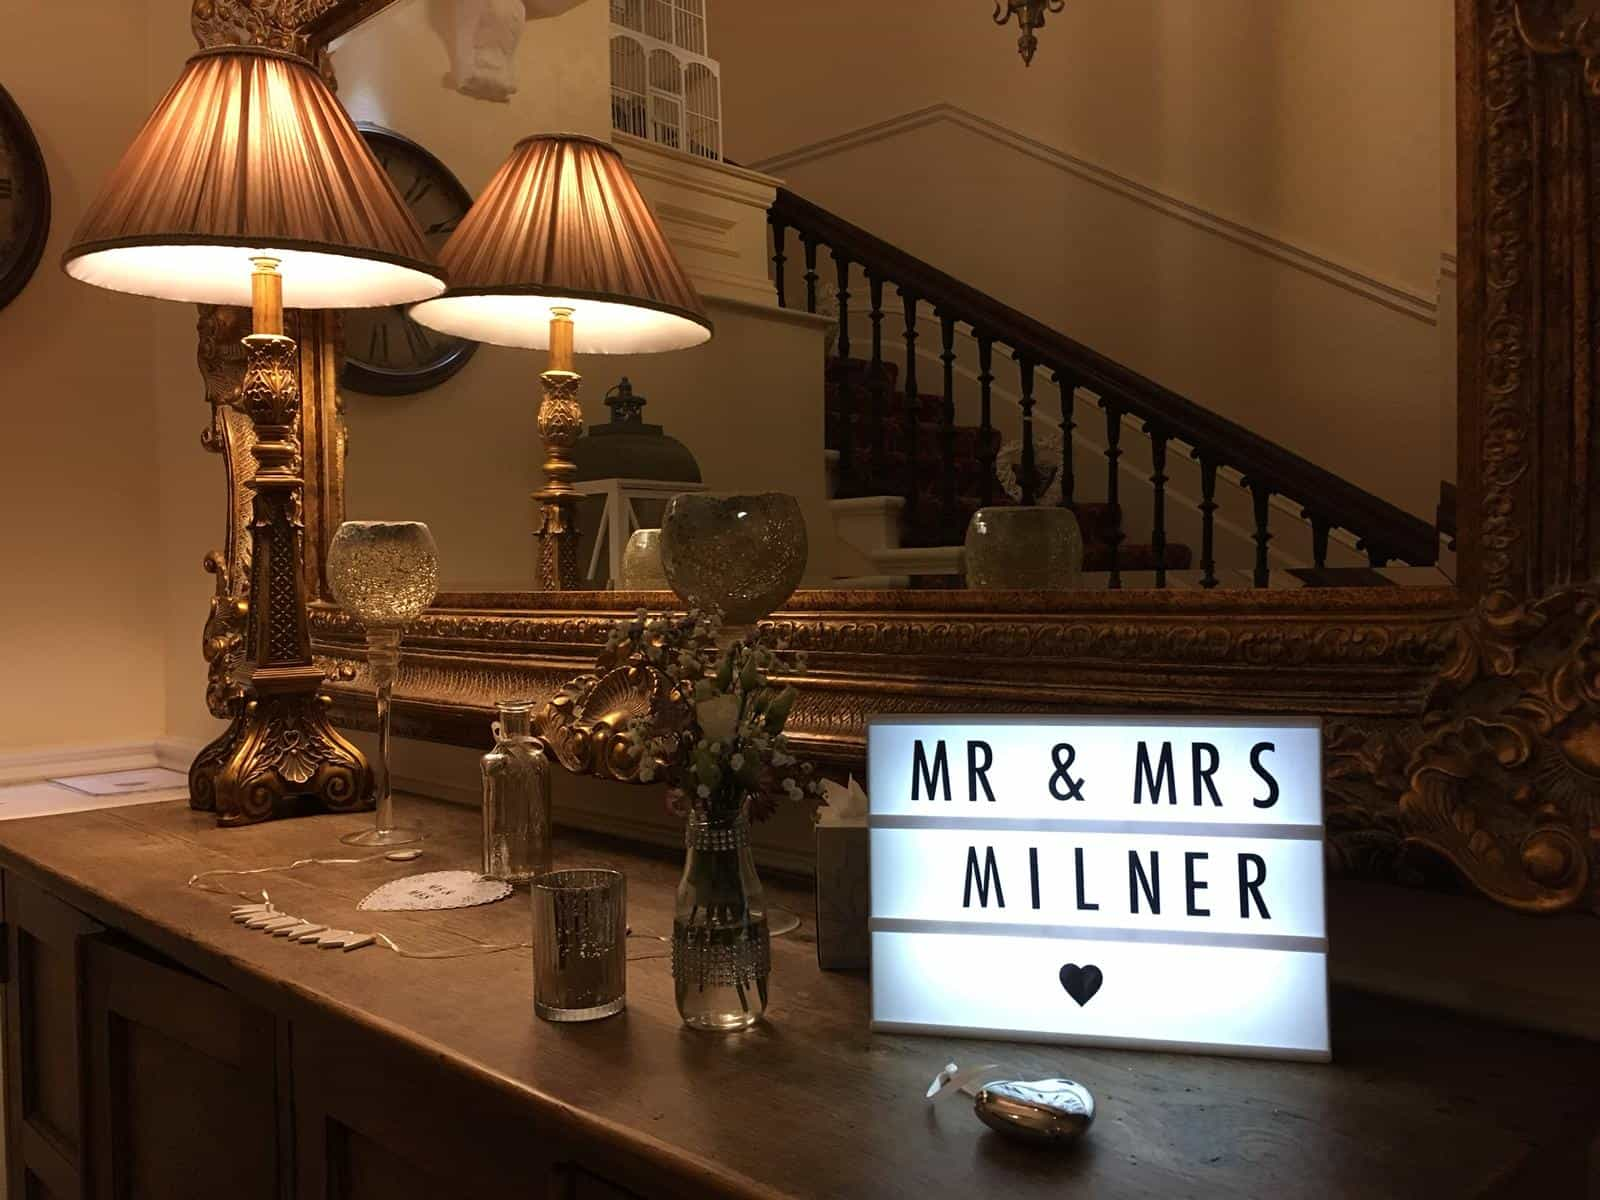 Wedding LED lights, on a table, spelling out 'Mr & Mrs Milner'